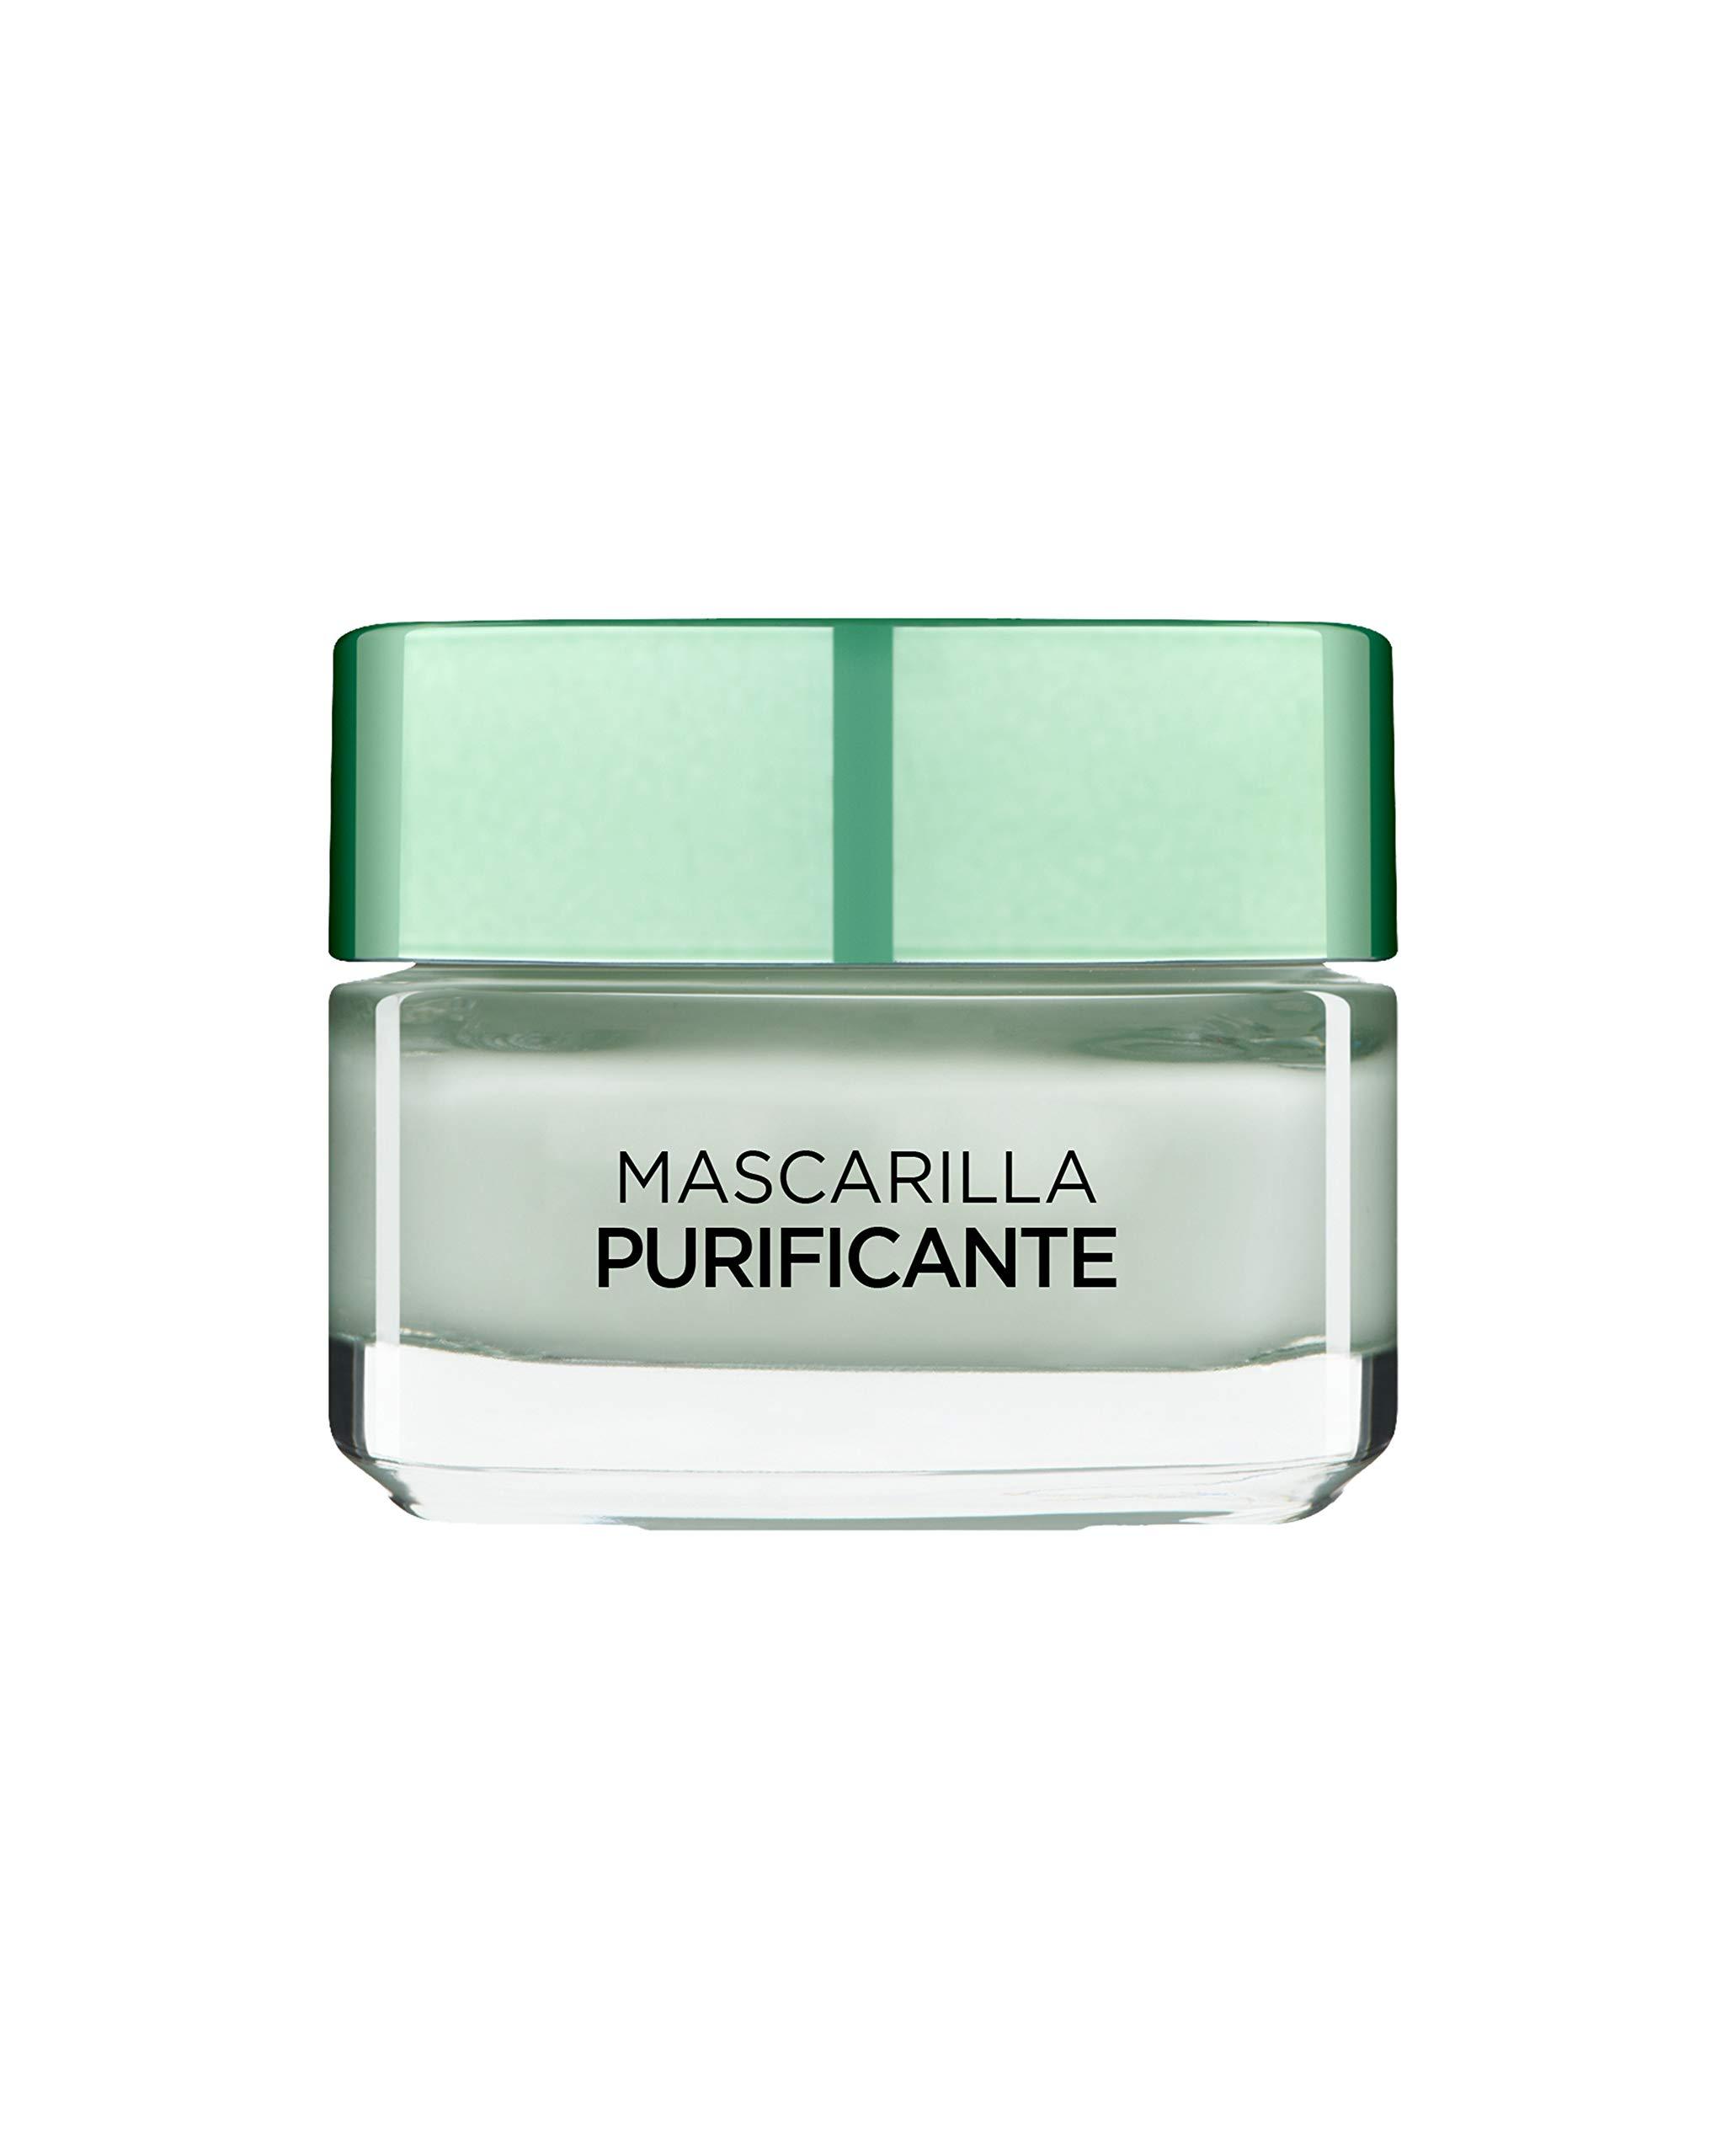 L'Oreal Paris Dermo Expertise Mascarilla Purificante, Arcillas Puras, Purifica y Matifica - 50 ml product image